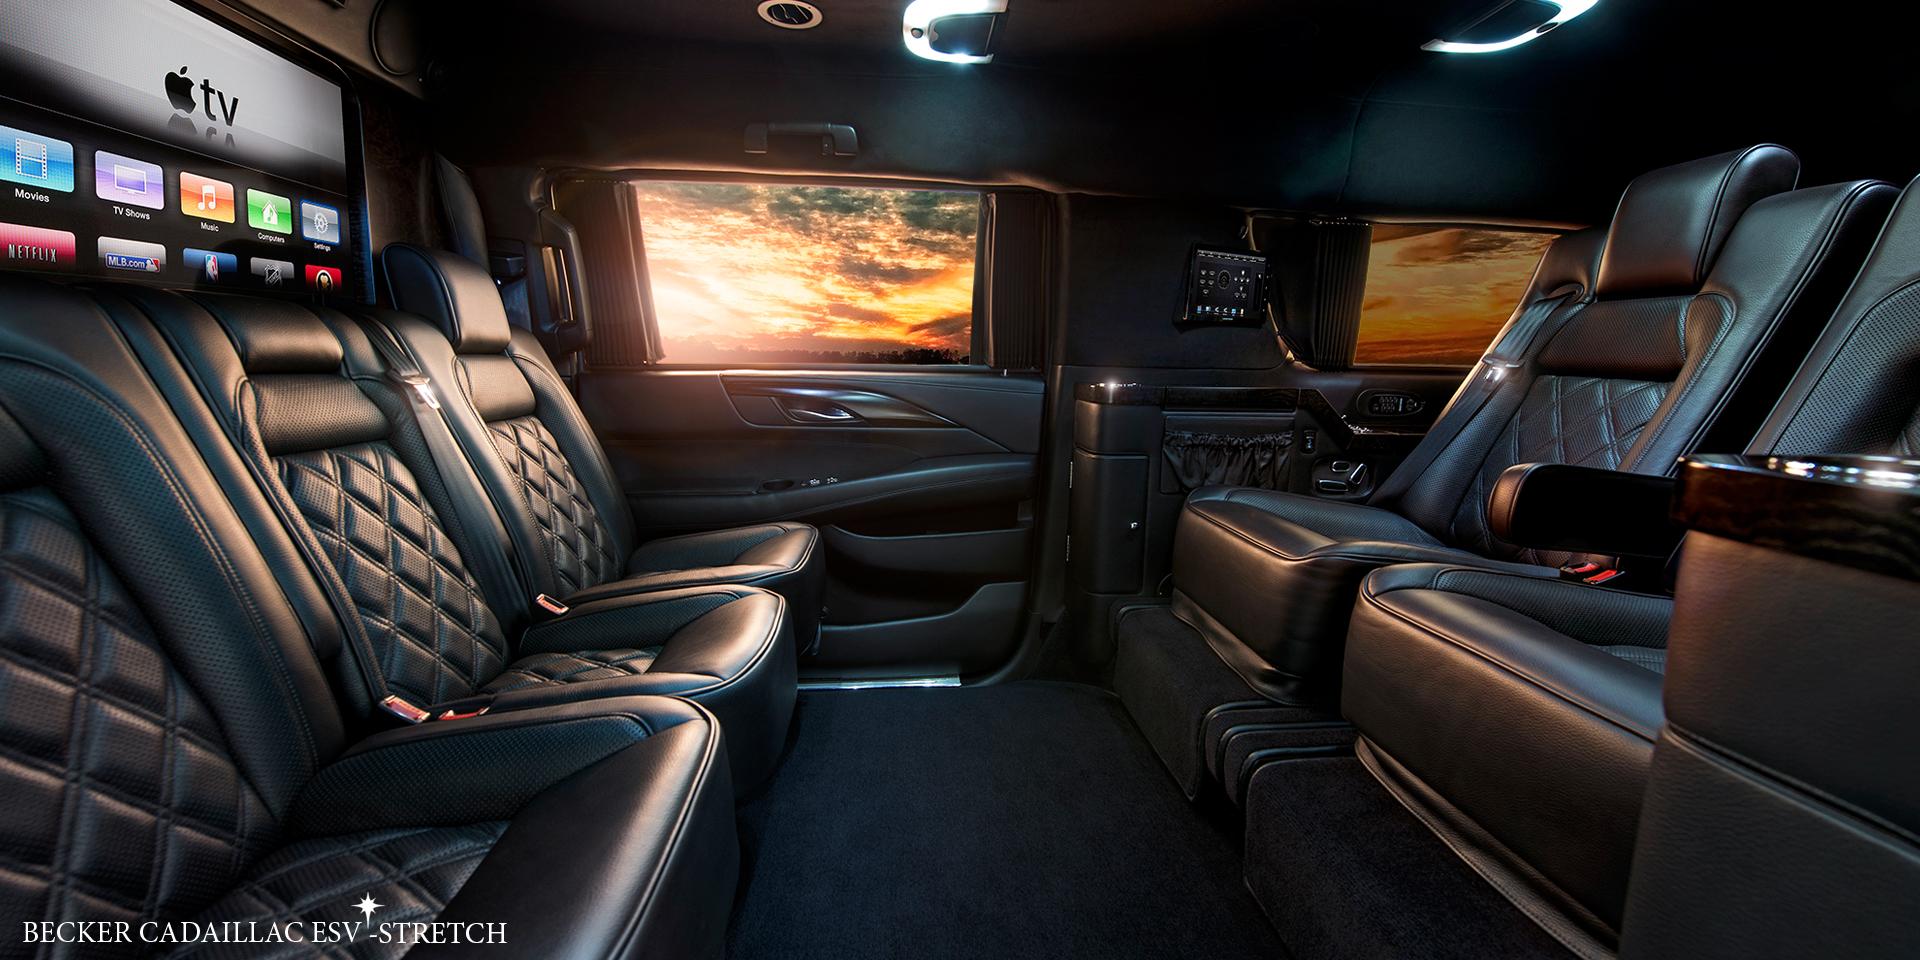 Cadillac Escalade 2017 Platinum Sky Edition >> Becker Automotive Design // Luxury Transport Coaches // Sprinter Van and Cadillac ESV Conversions